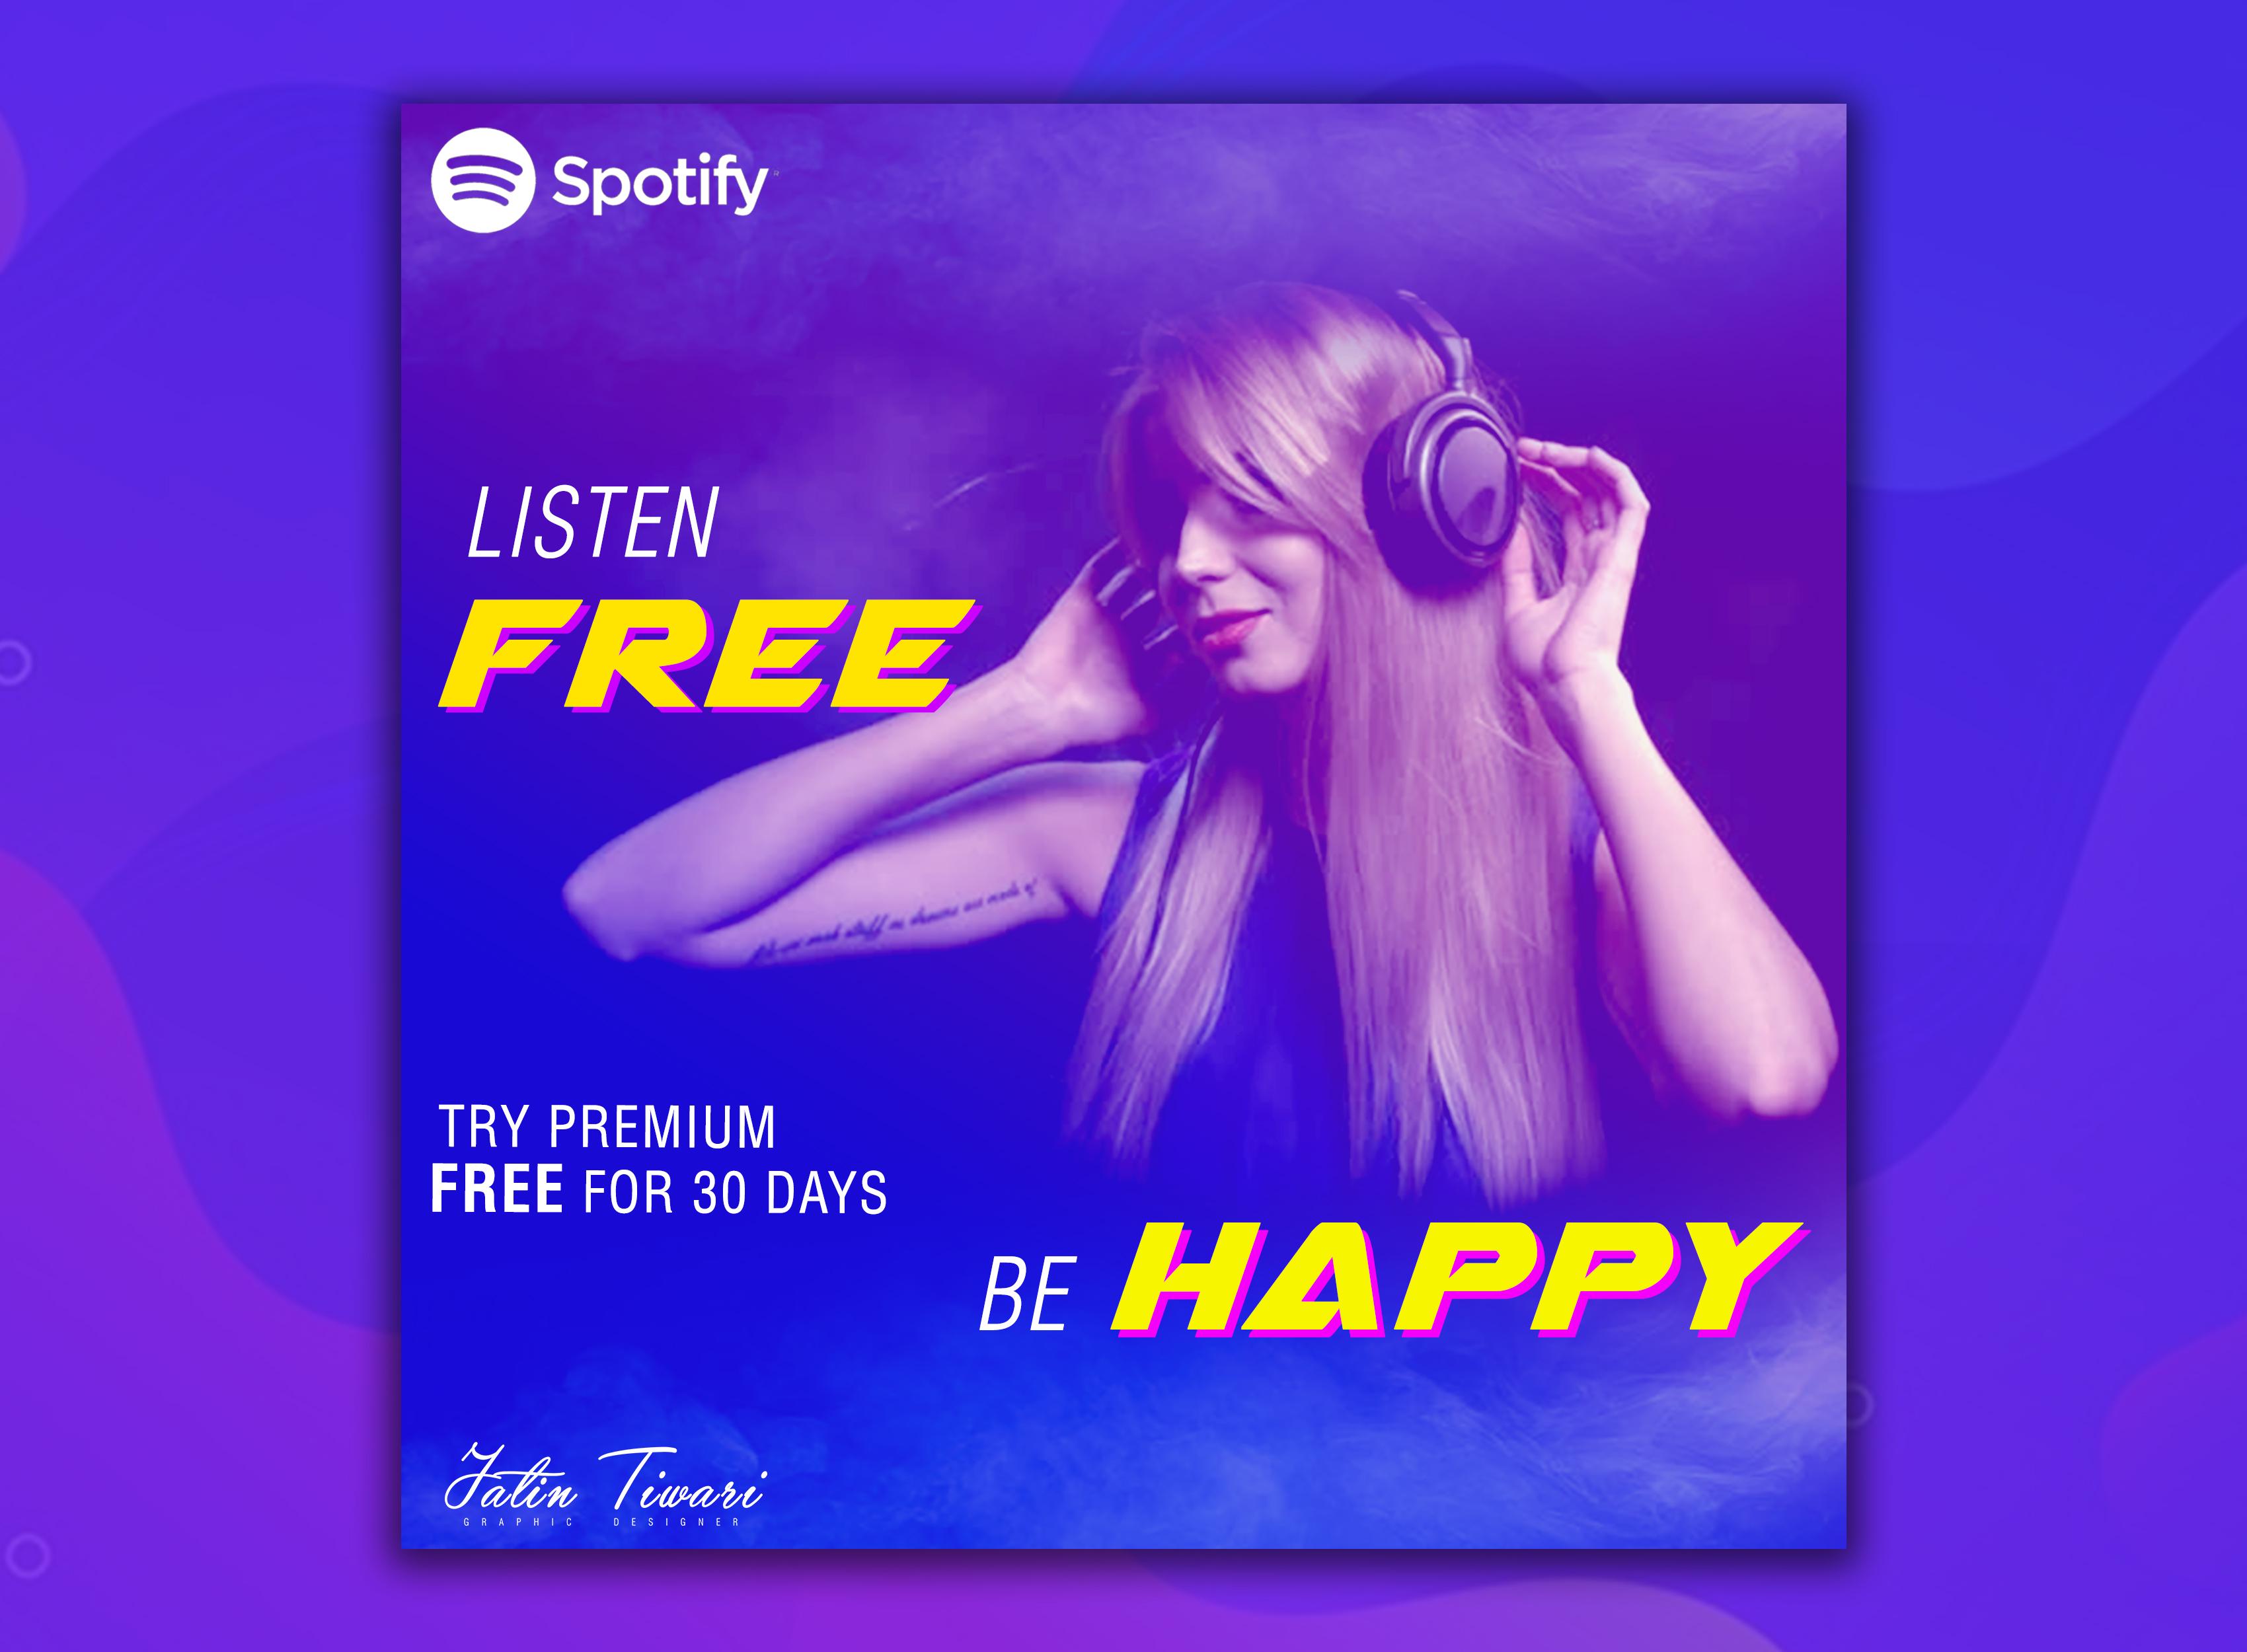 Spotify Poster Design